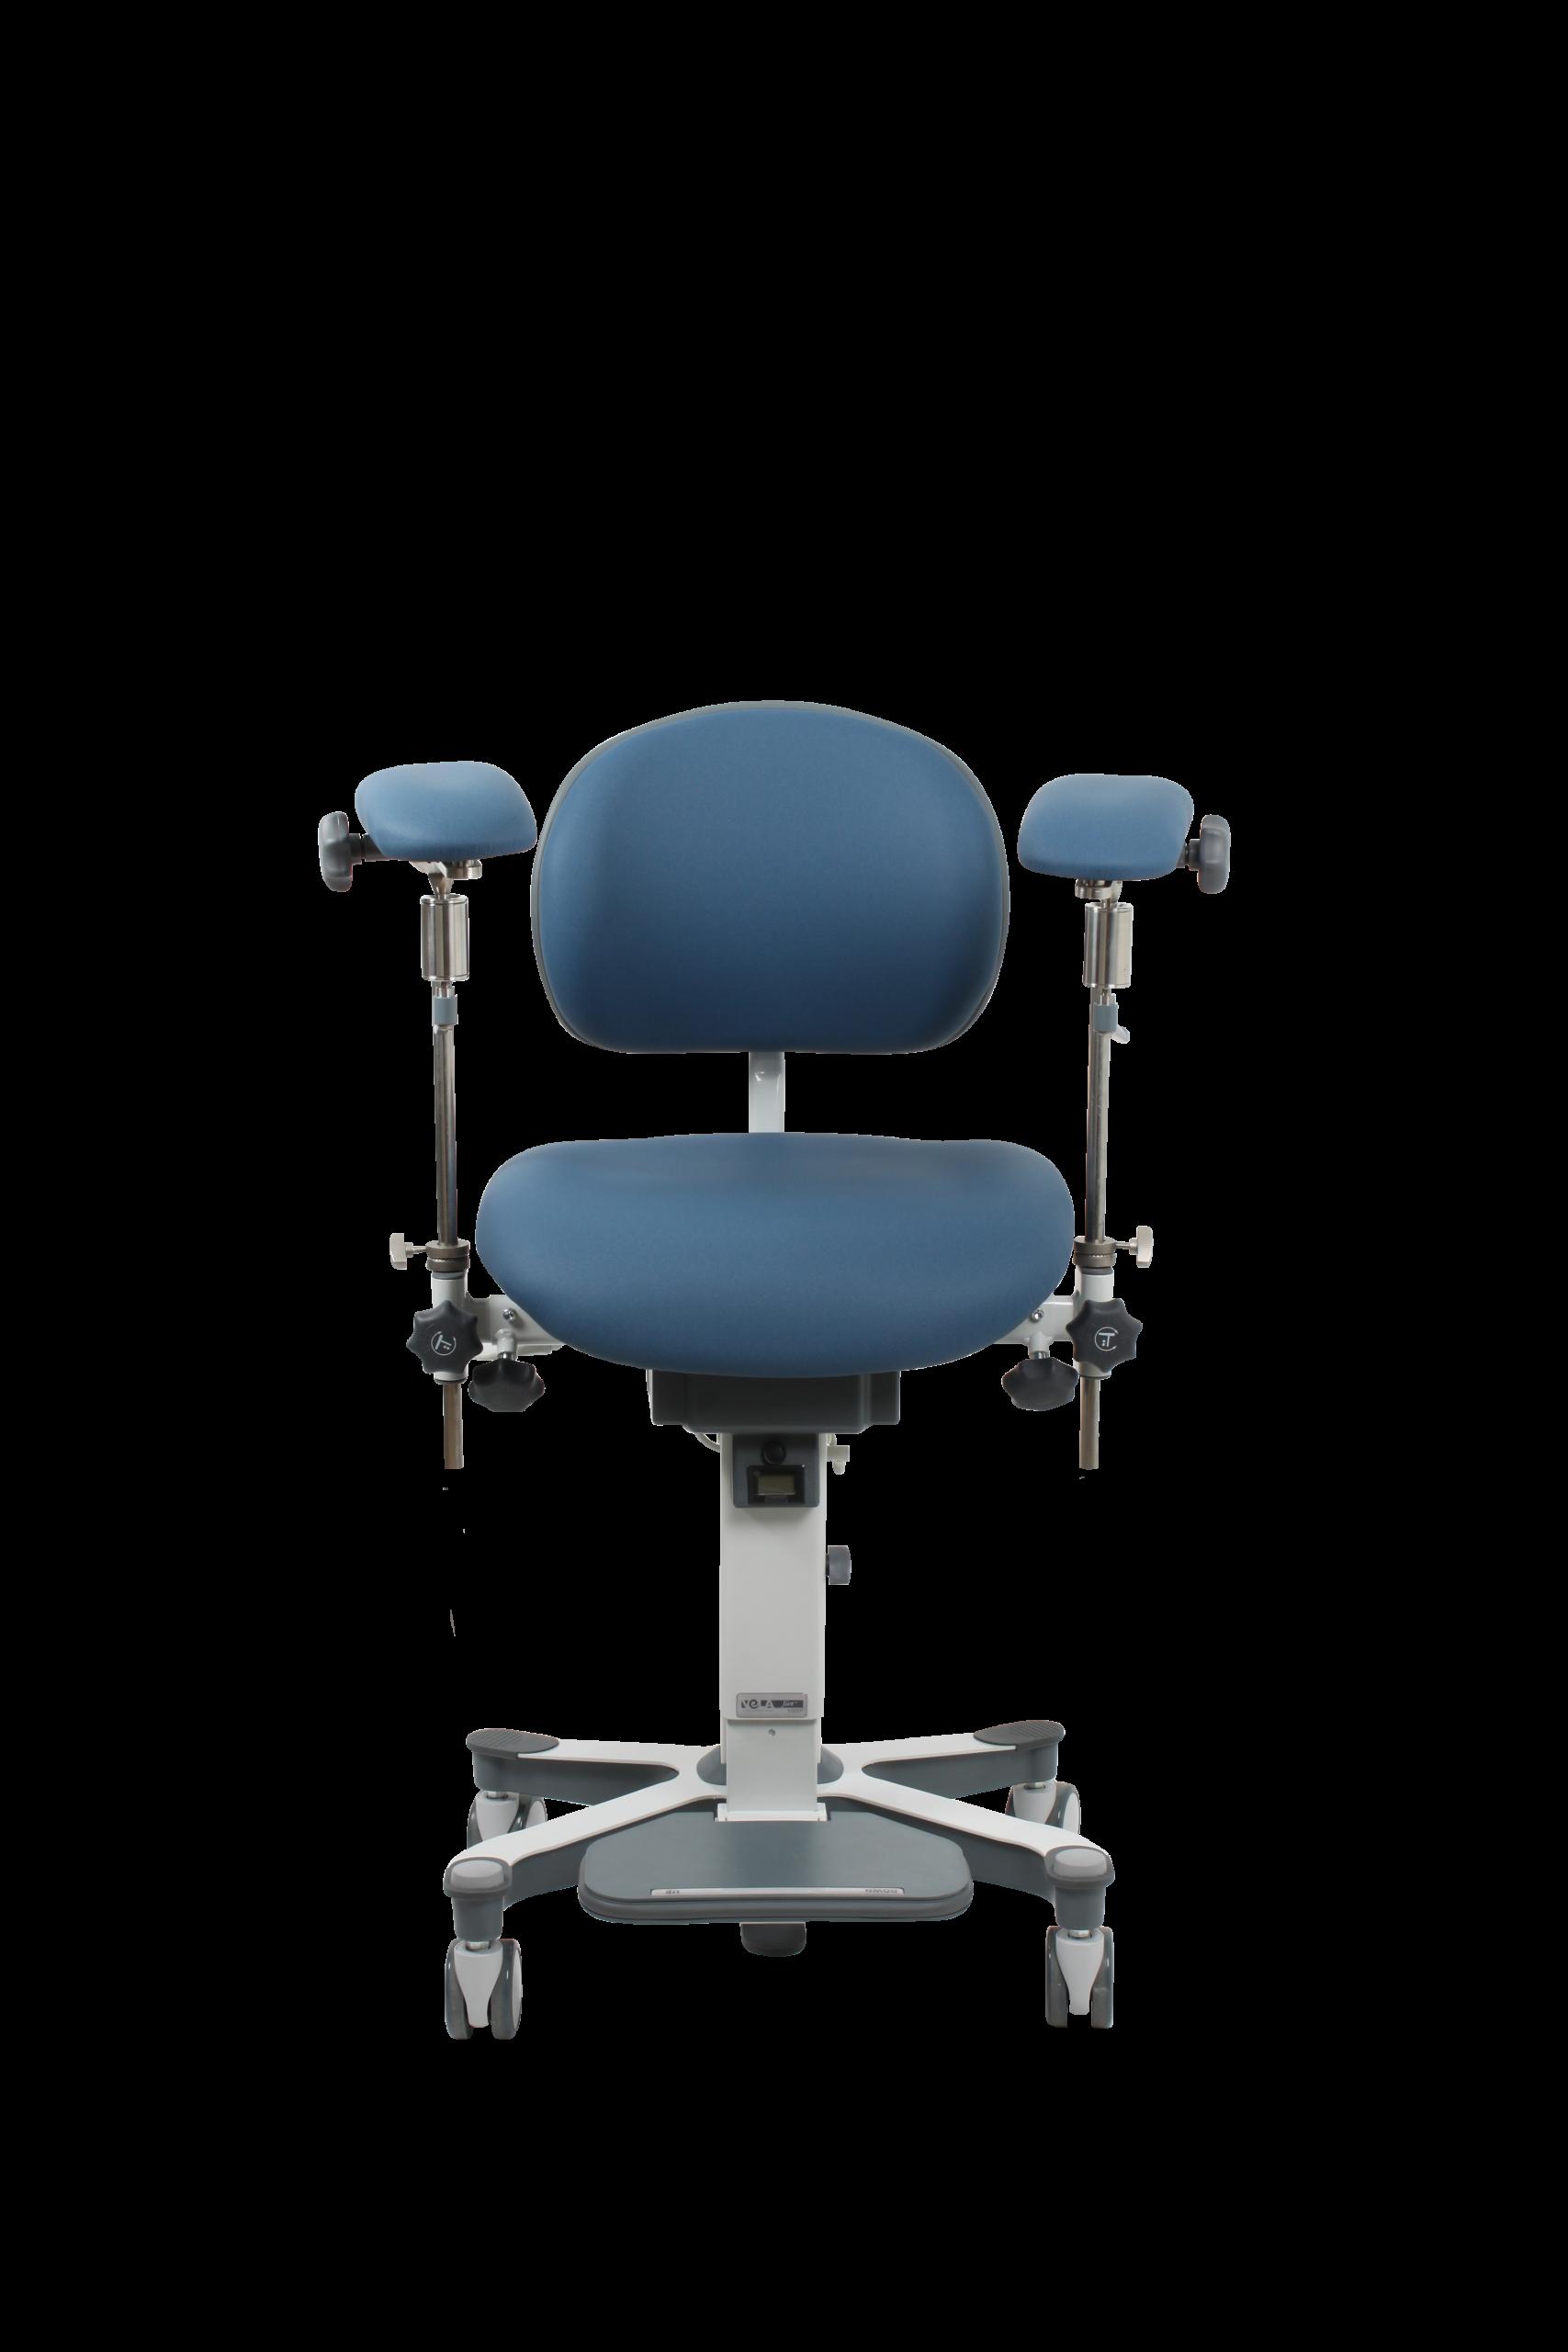 https://www.lameris-group.nl/wp-content/uploads/2020/03/VELA-Support-Surgerons-Chair-front-fritlagt-scaled.png